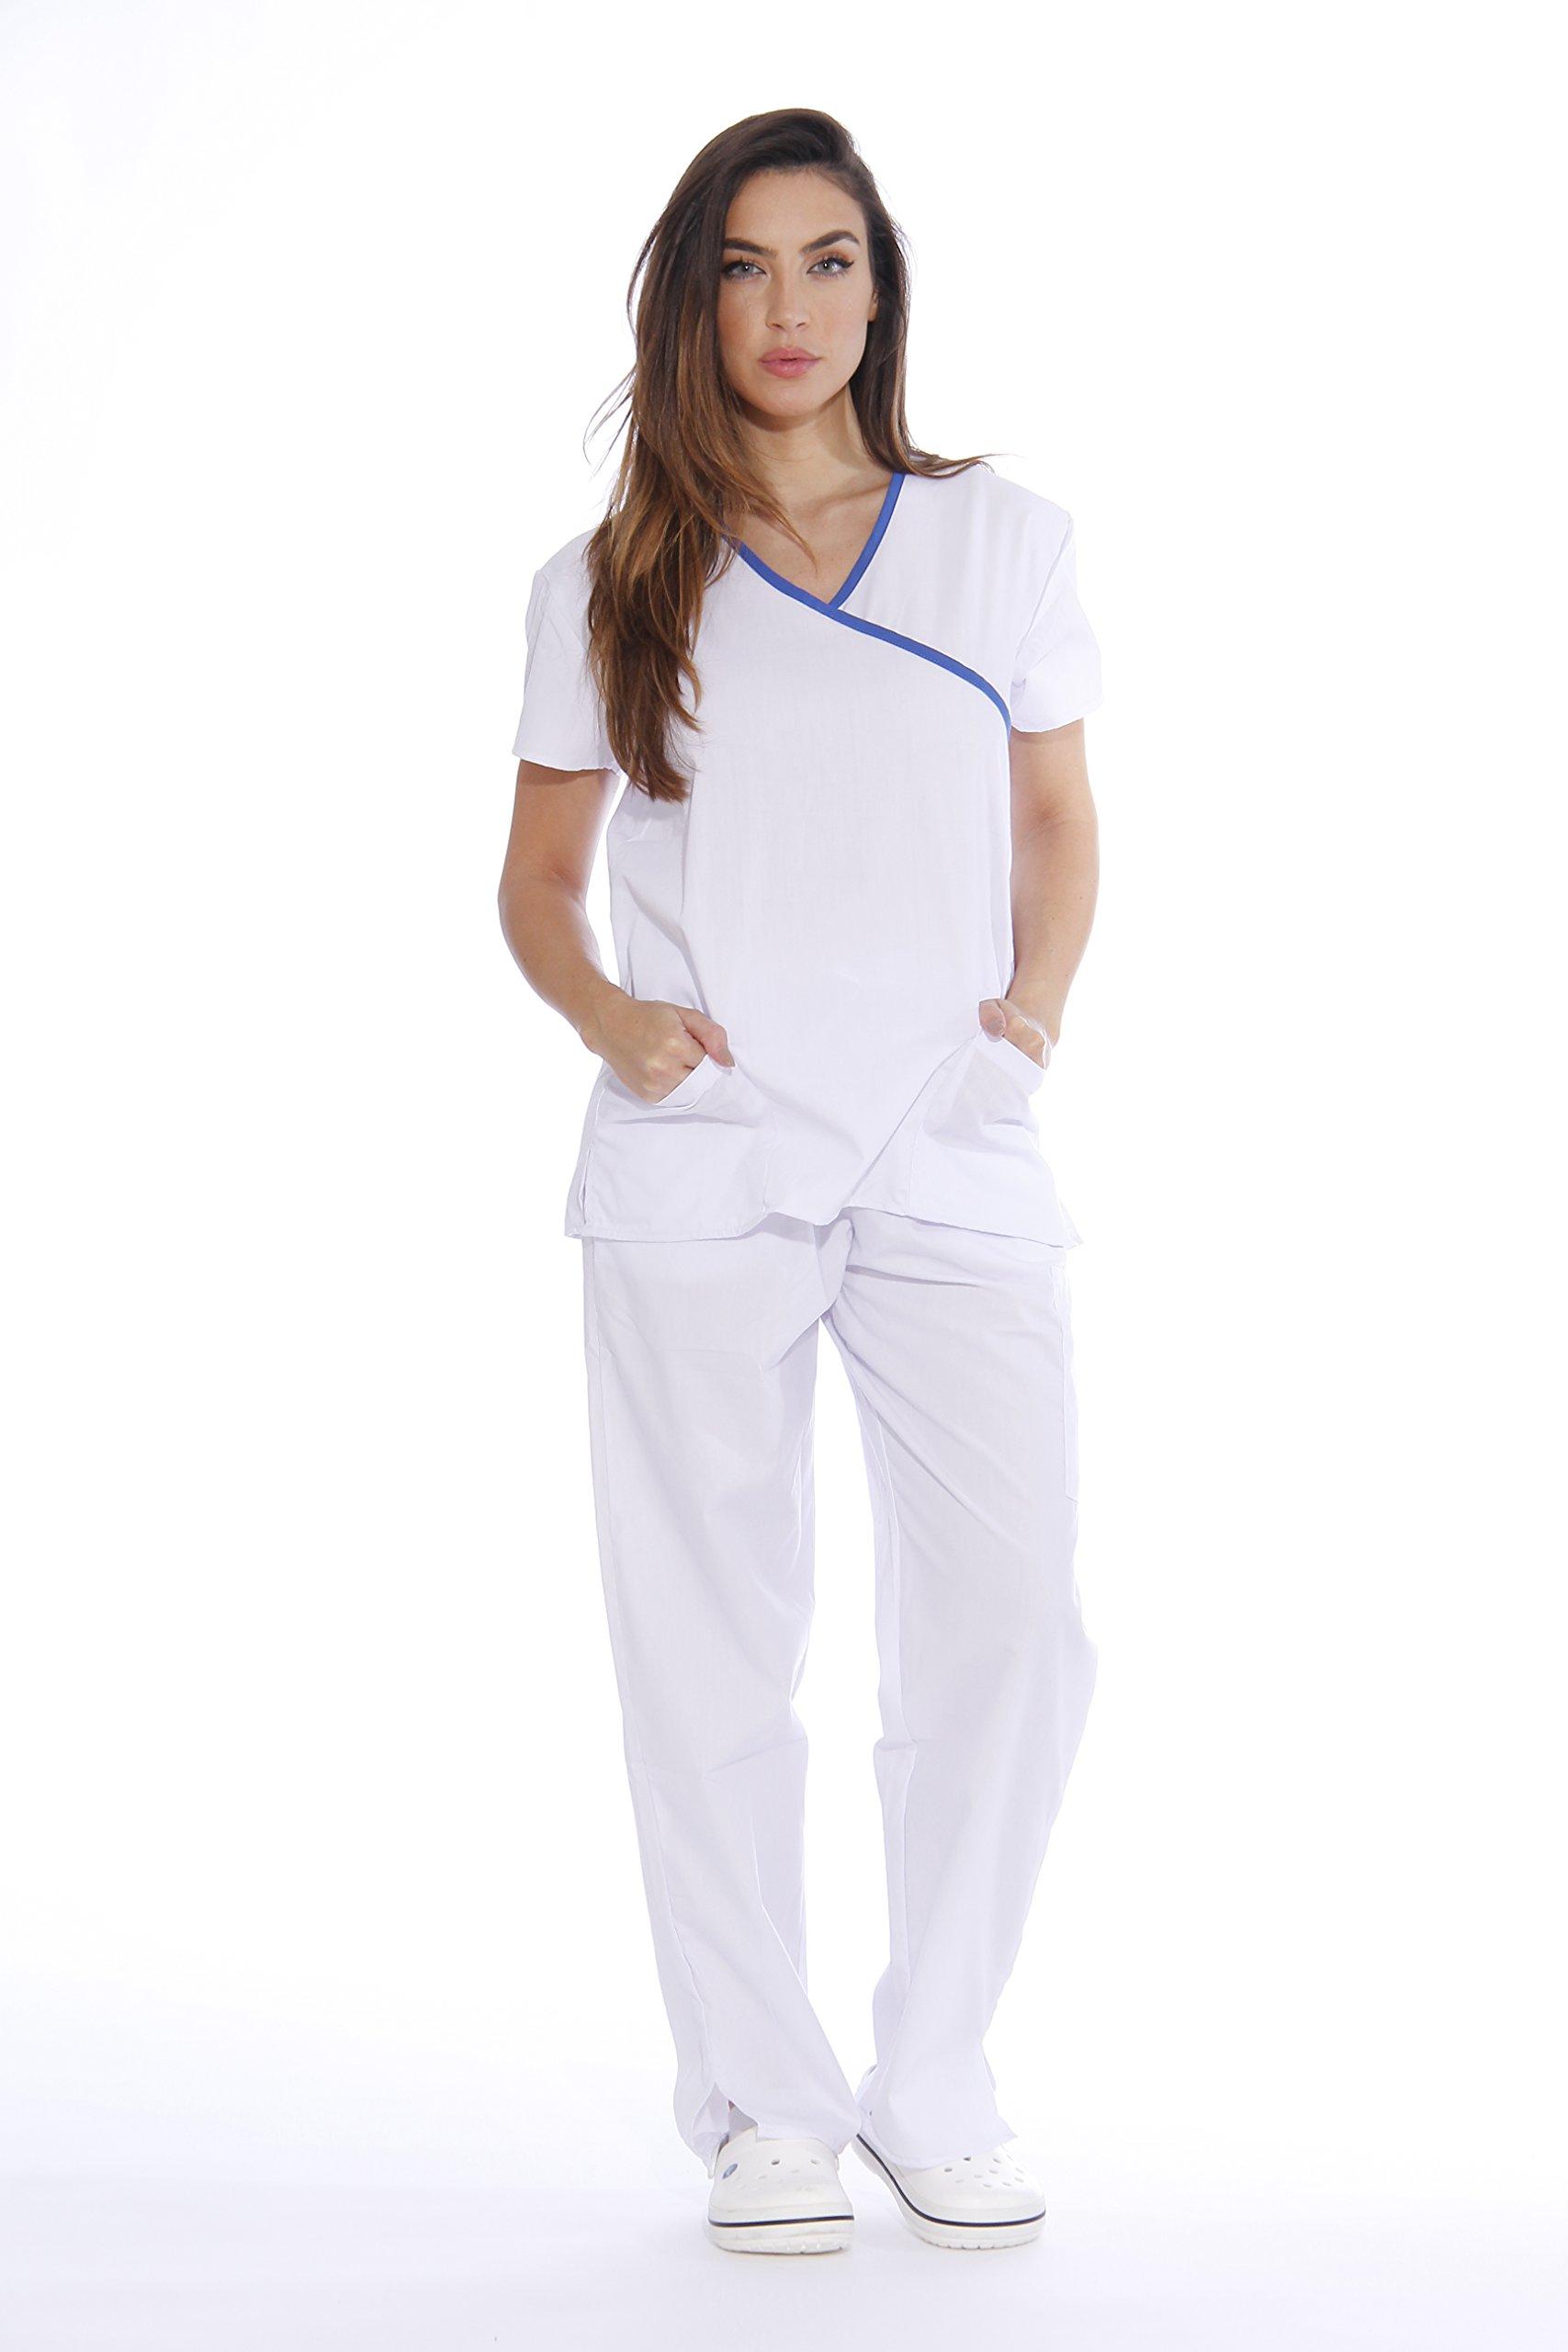 3b2ac4069f0 Galleon - 11145W Just Love Women's Scrub Sets / Medical Scrubs / Nursing  Scrubs - S, White With Royal Blue Trim,White With Royal Blue Trim,Small